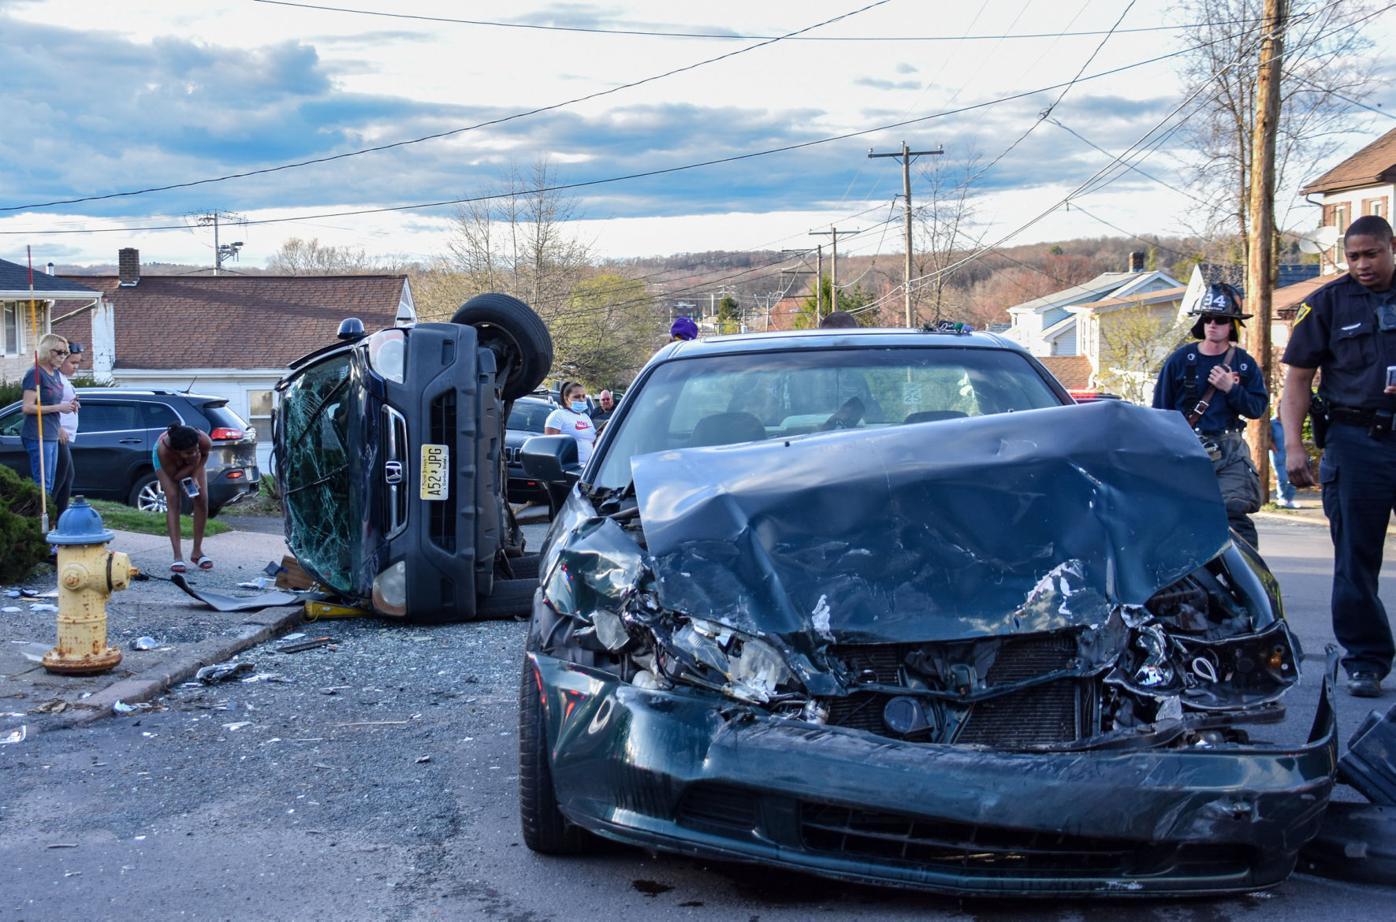 2 vehicles crash in city